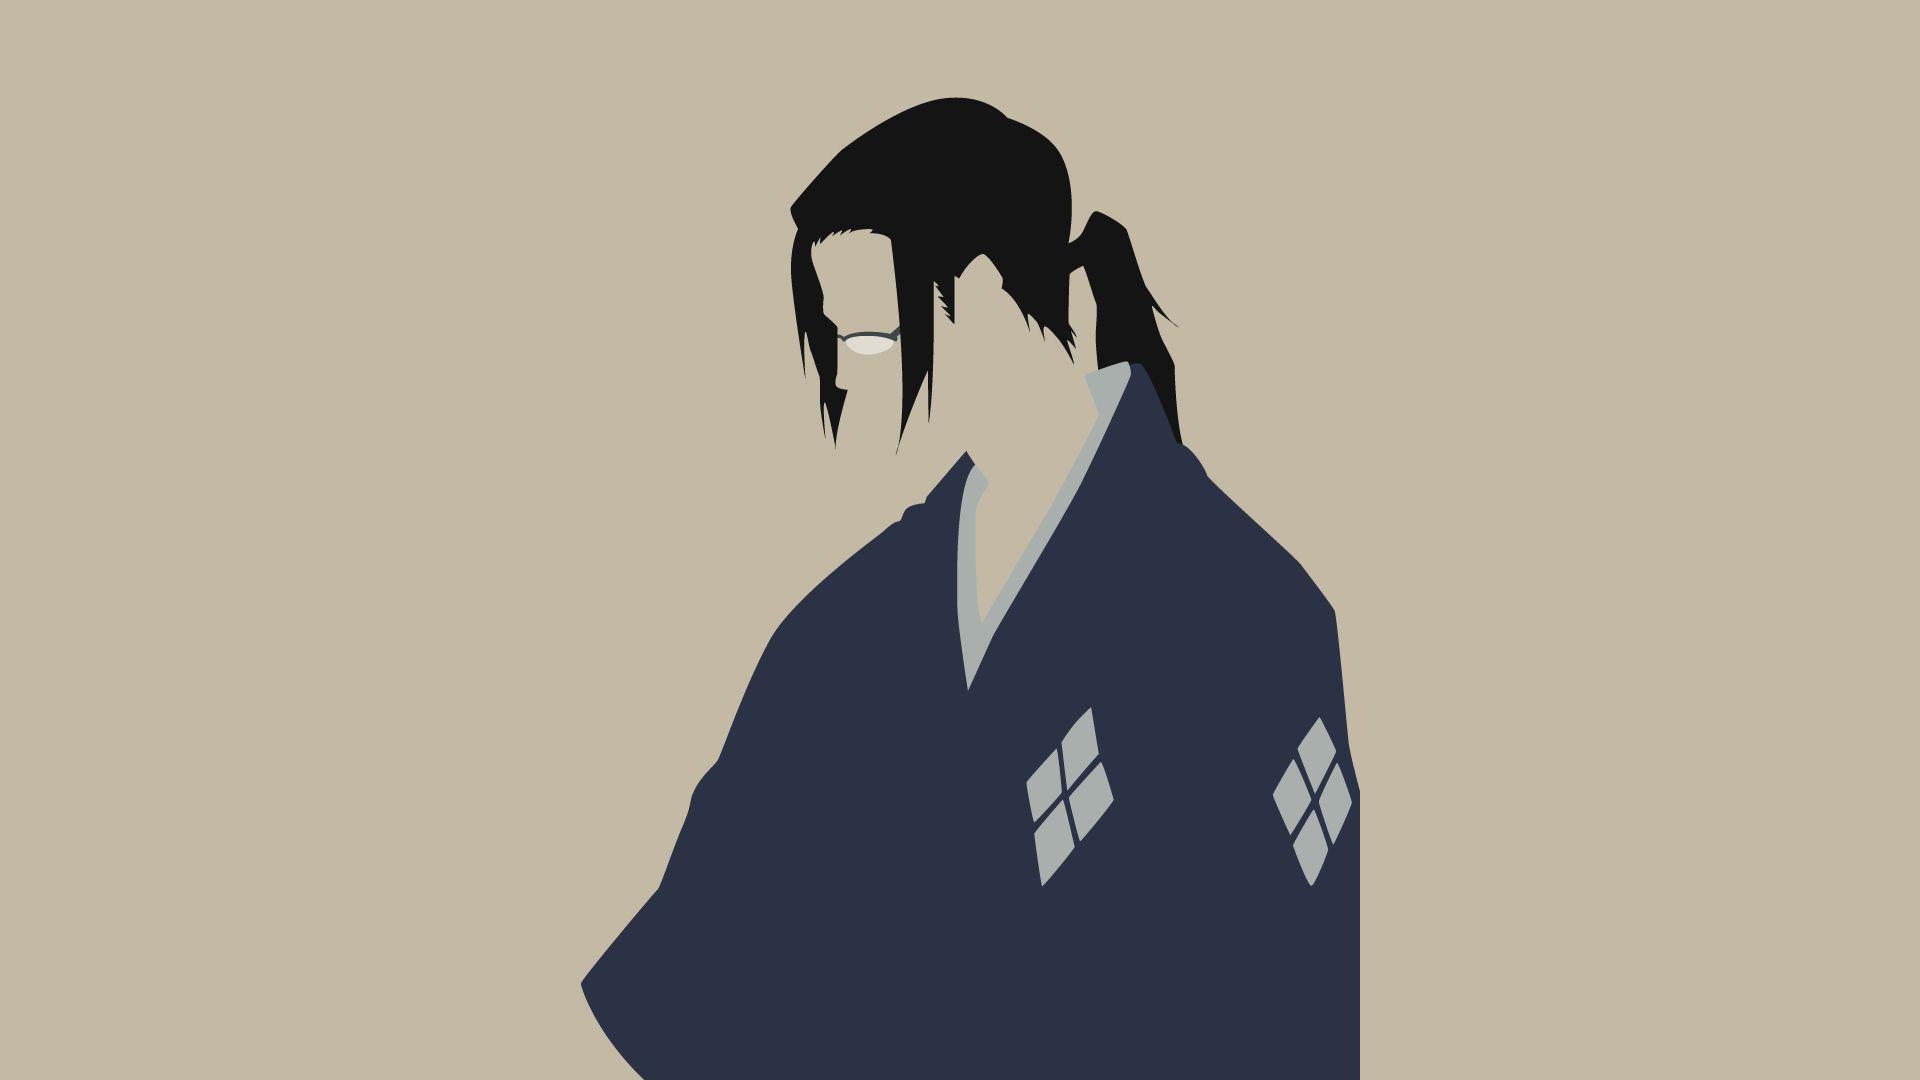 Mugen Samurai Champloo Minimalist Wallpaper Samurai Champloo Samurai Anime Samurai